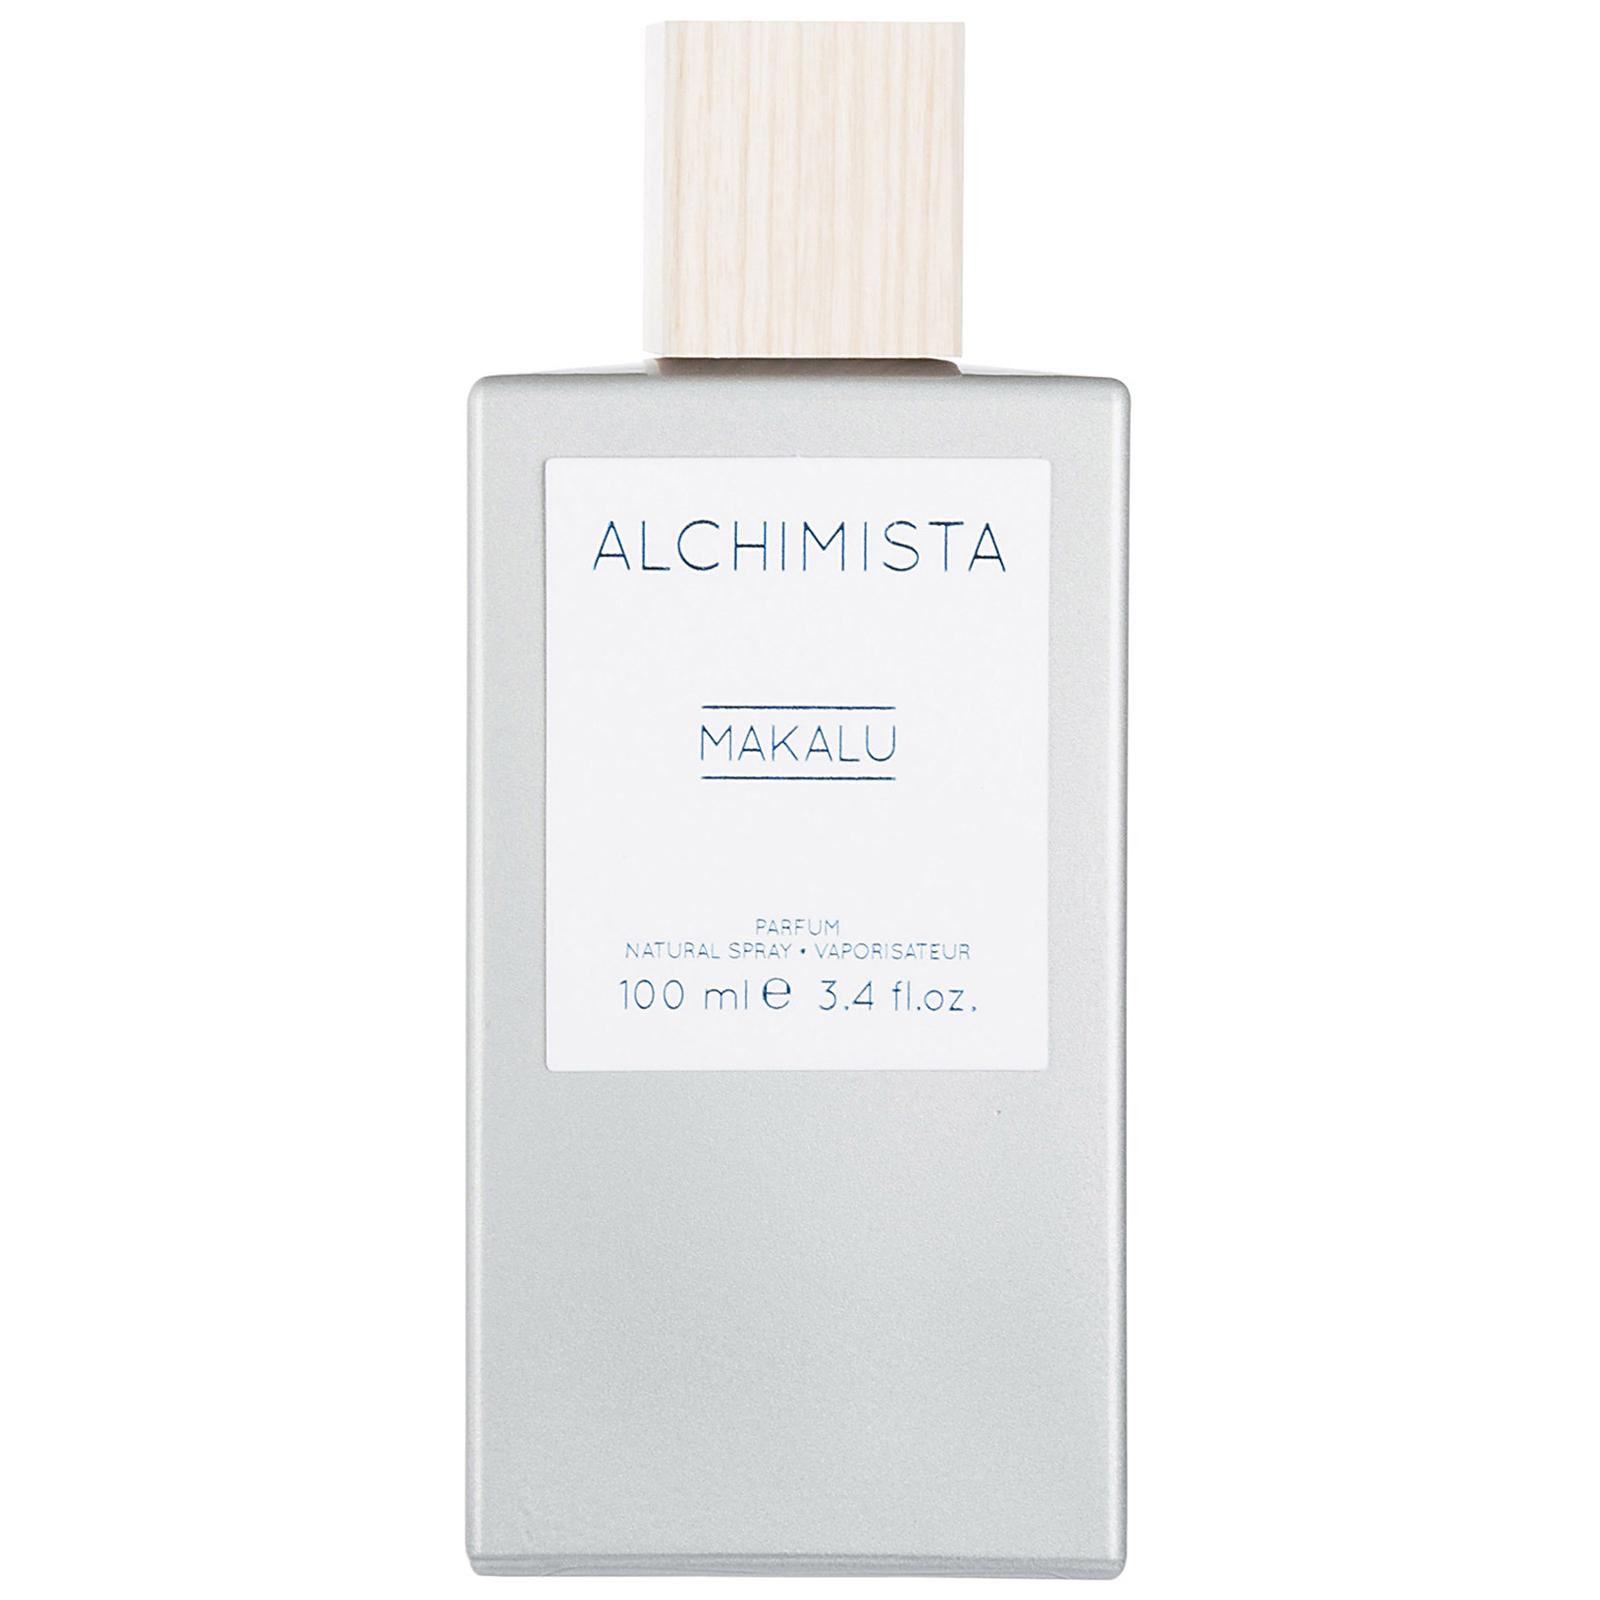 Makalu profumo parfum 100 ml